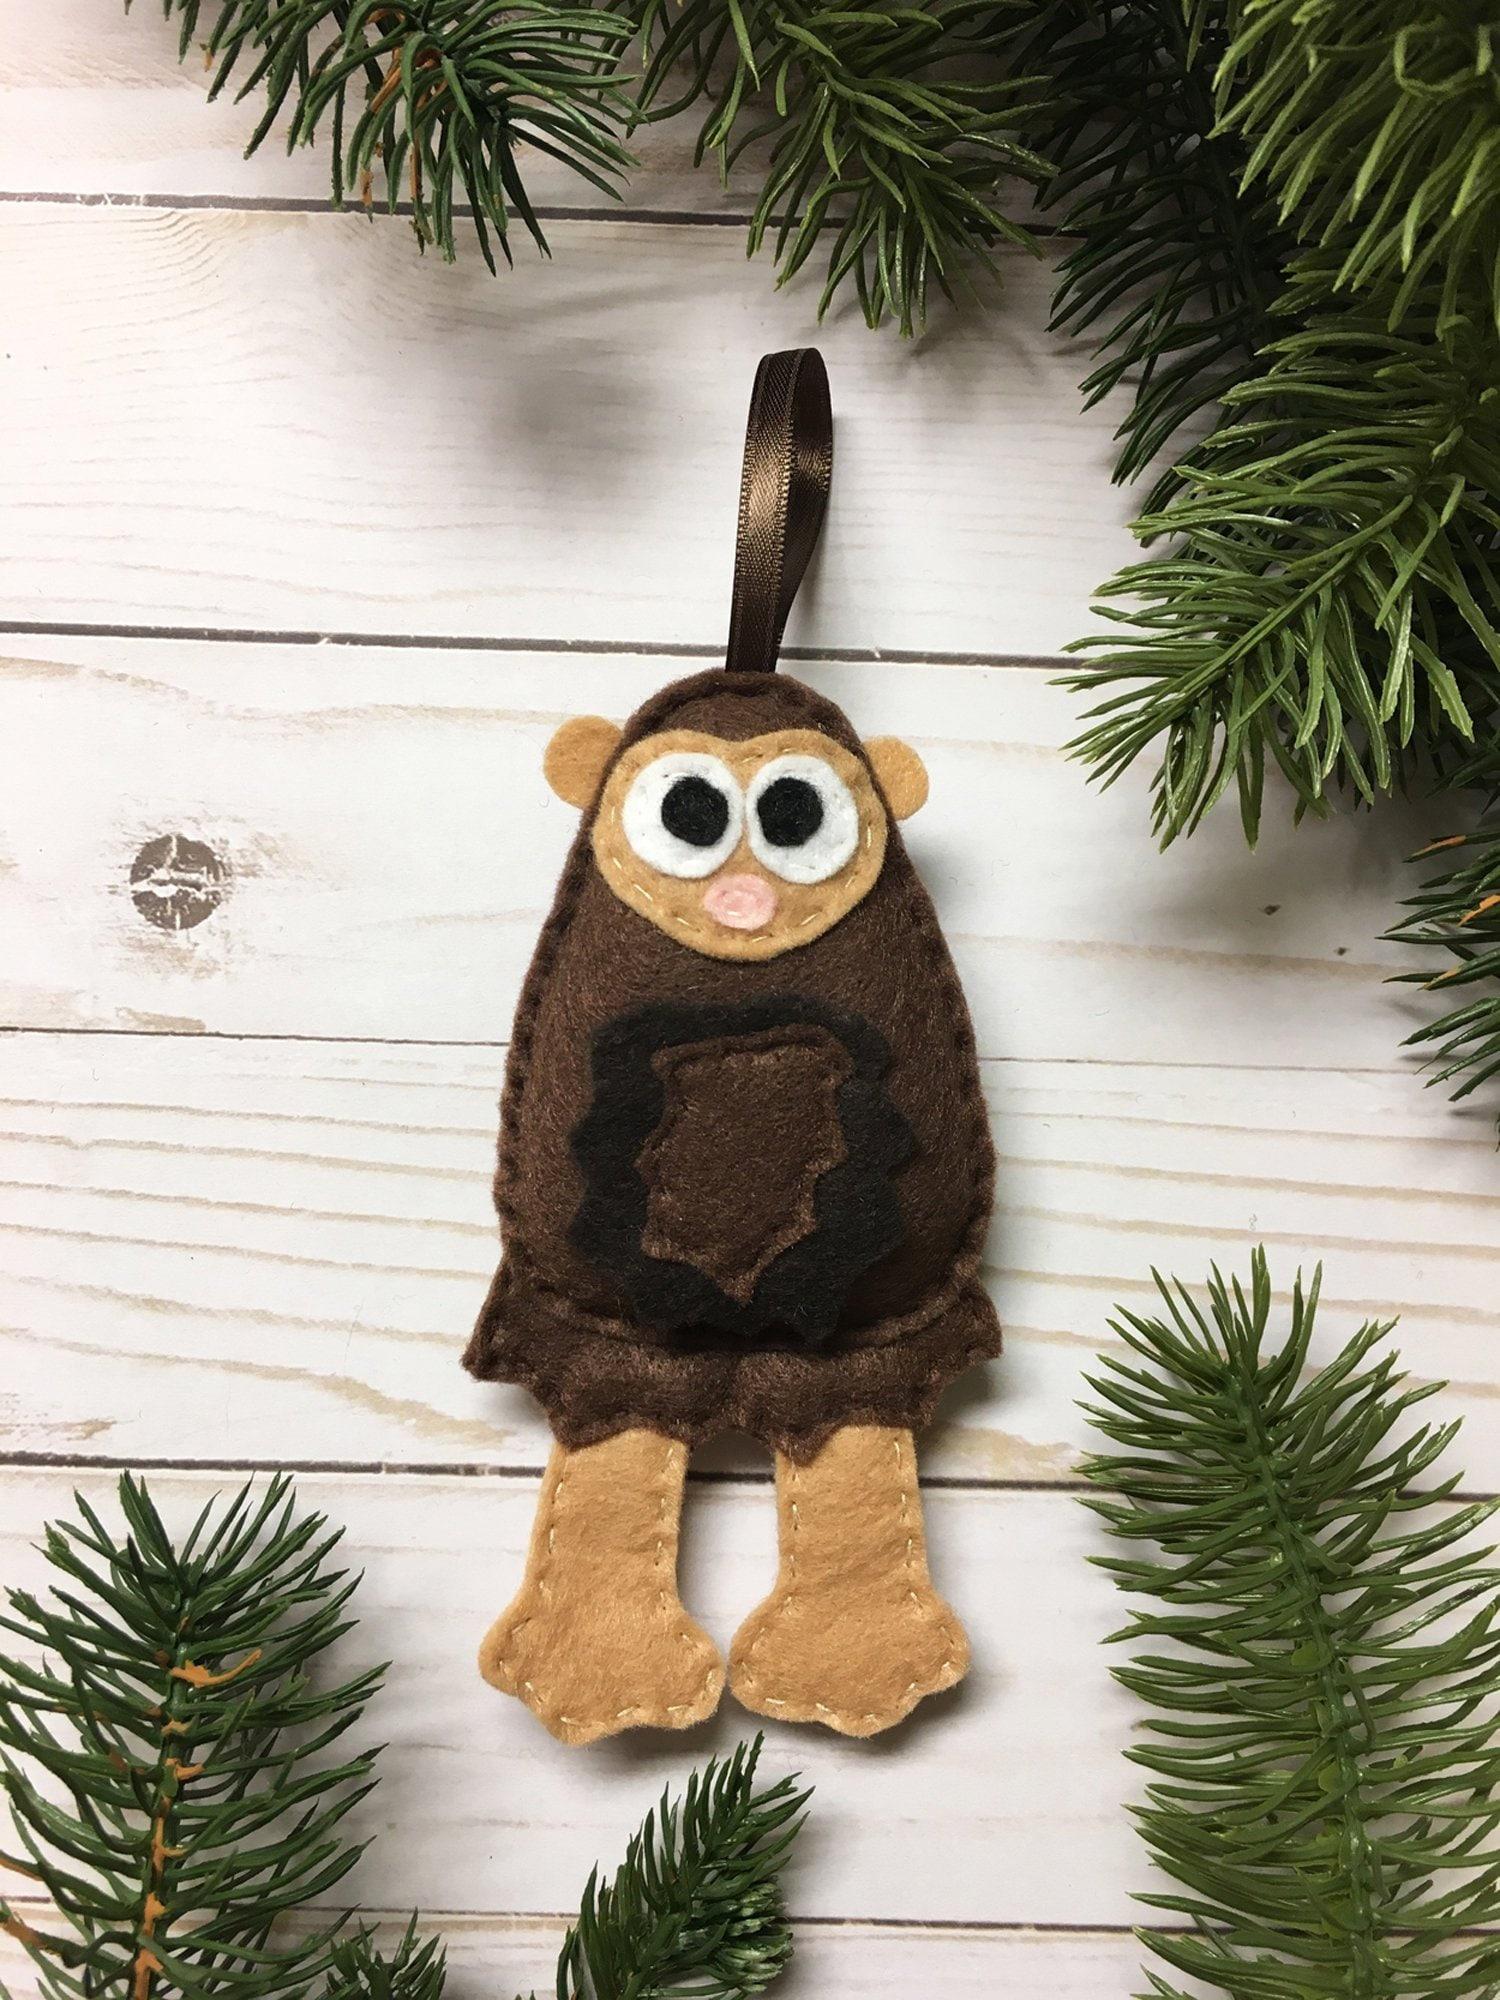 sasquatch bigfoot ornament christmas ornament harold the sasquatch - Bigfoot Christmas Ornament